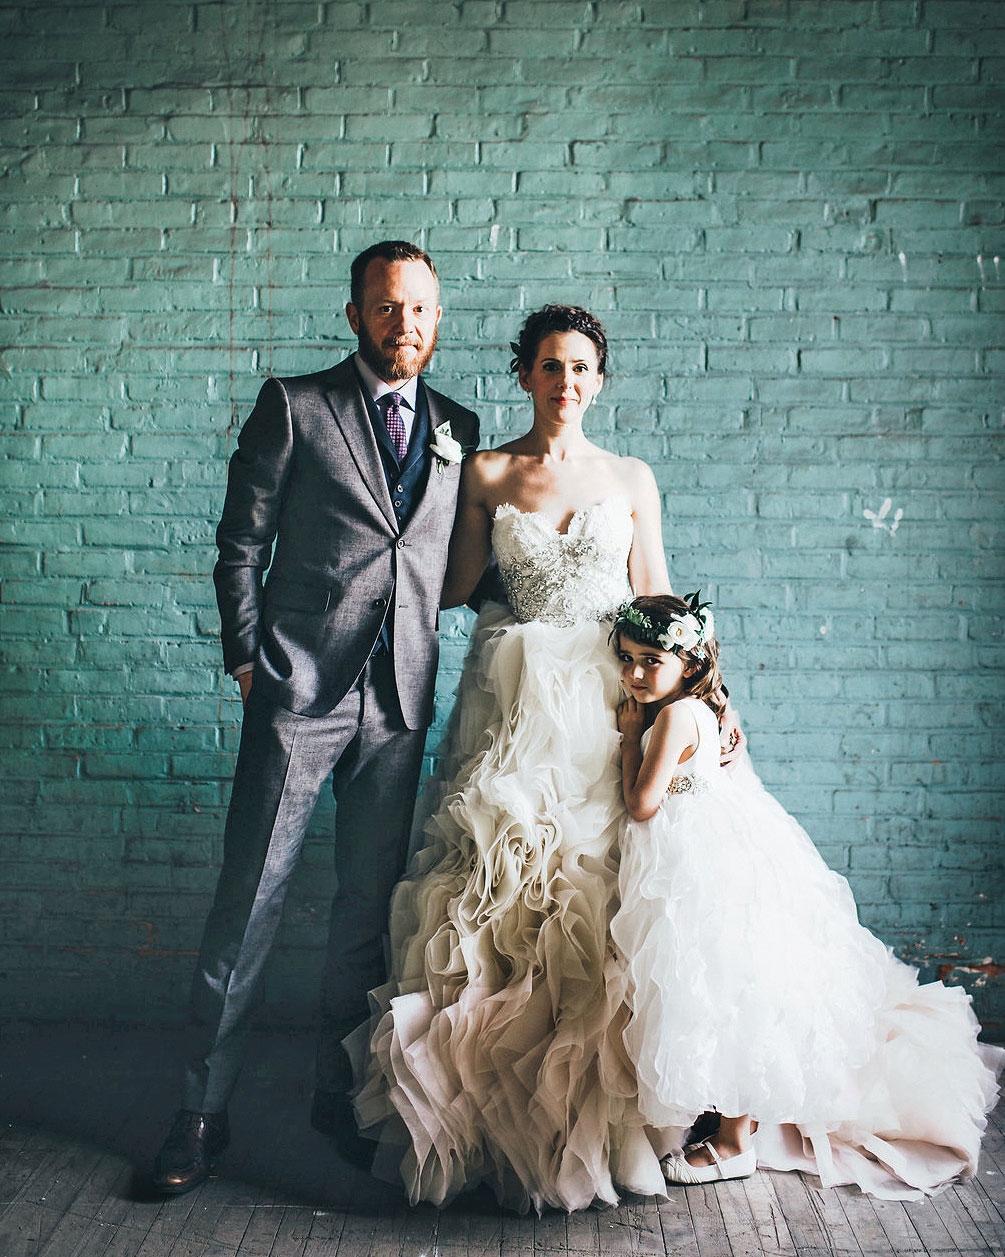 moira-dustin-real-wedding-potrait-bride-groom.jpg